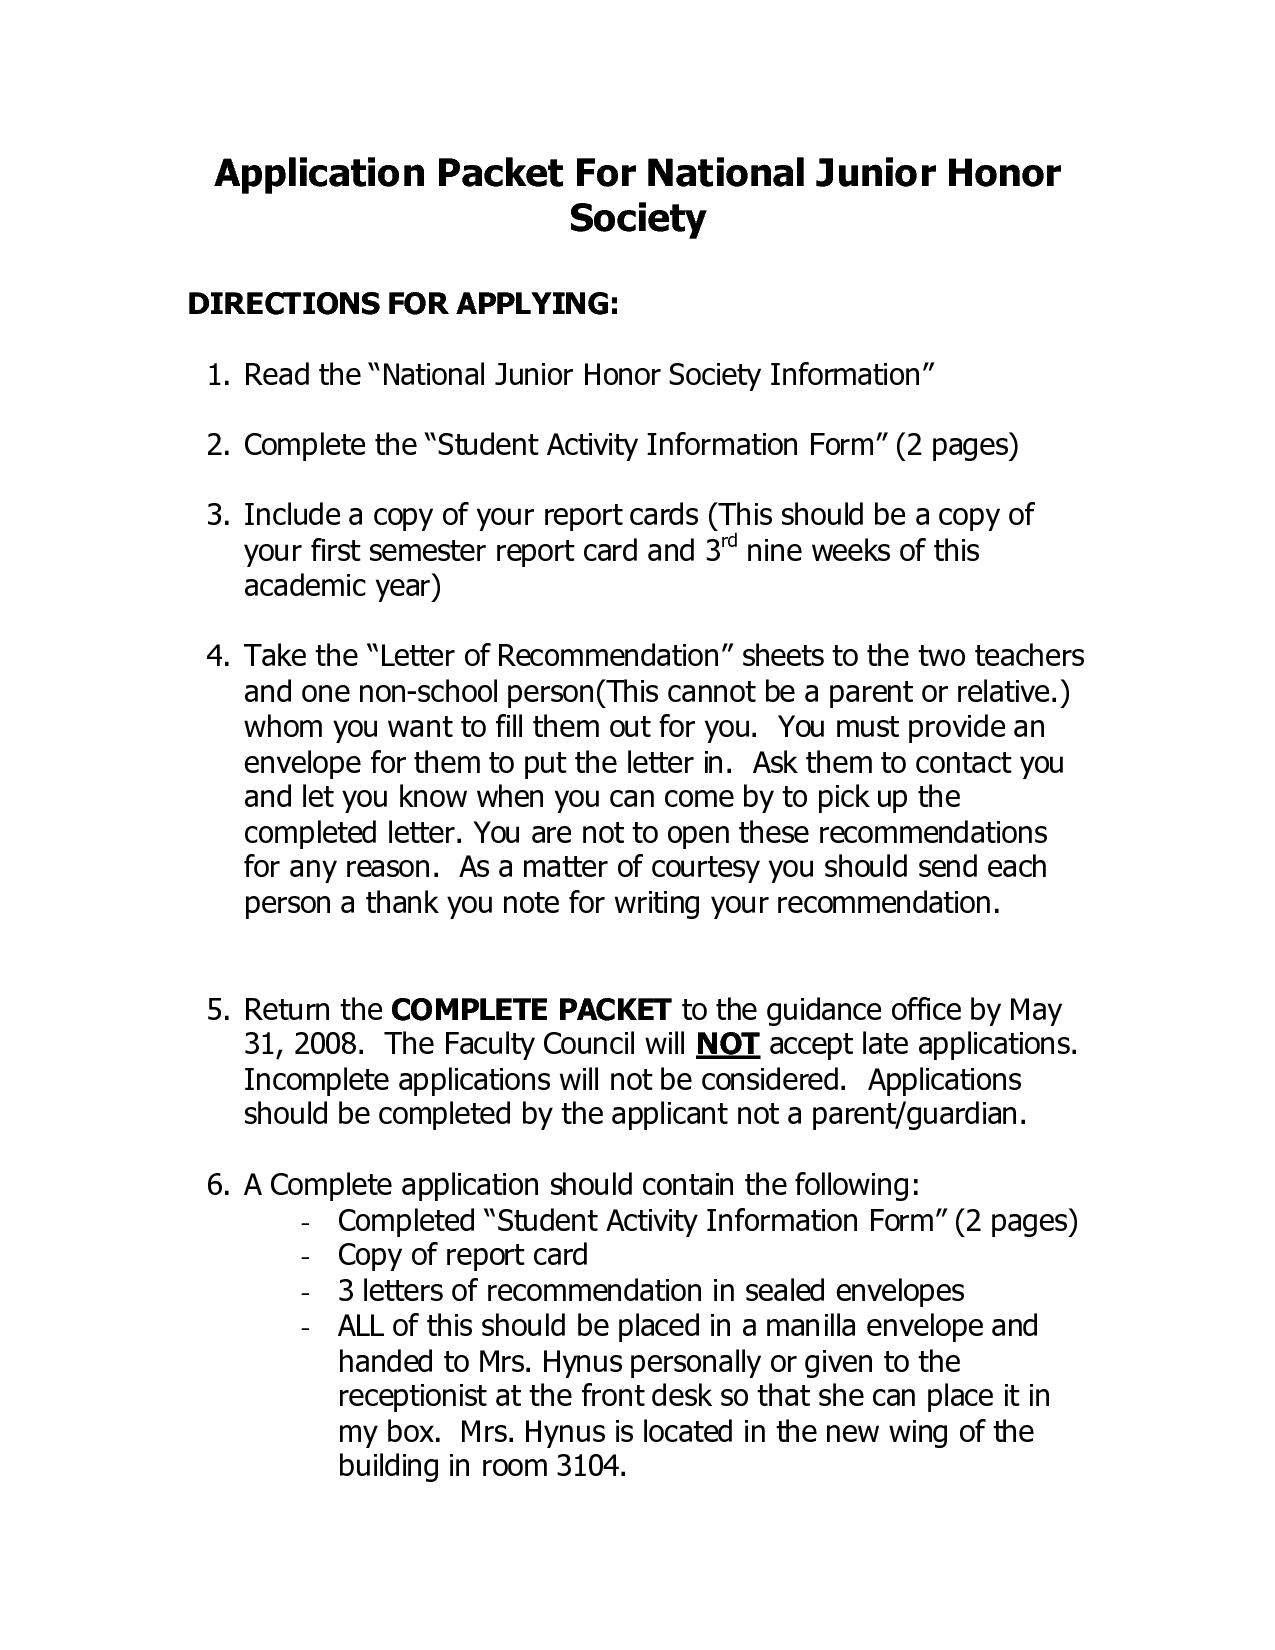 national junior honor society essay help